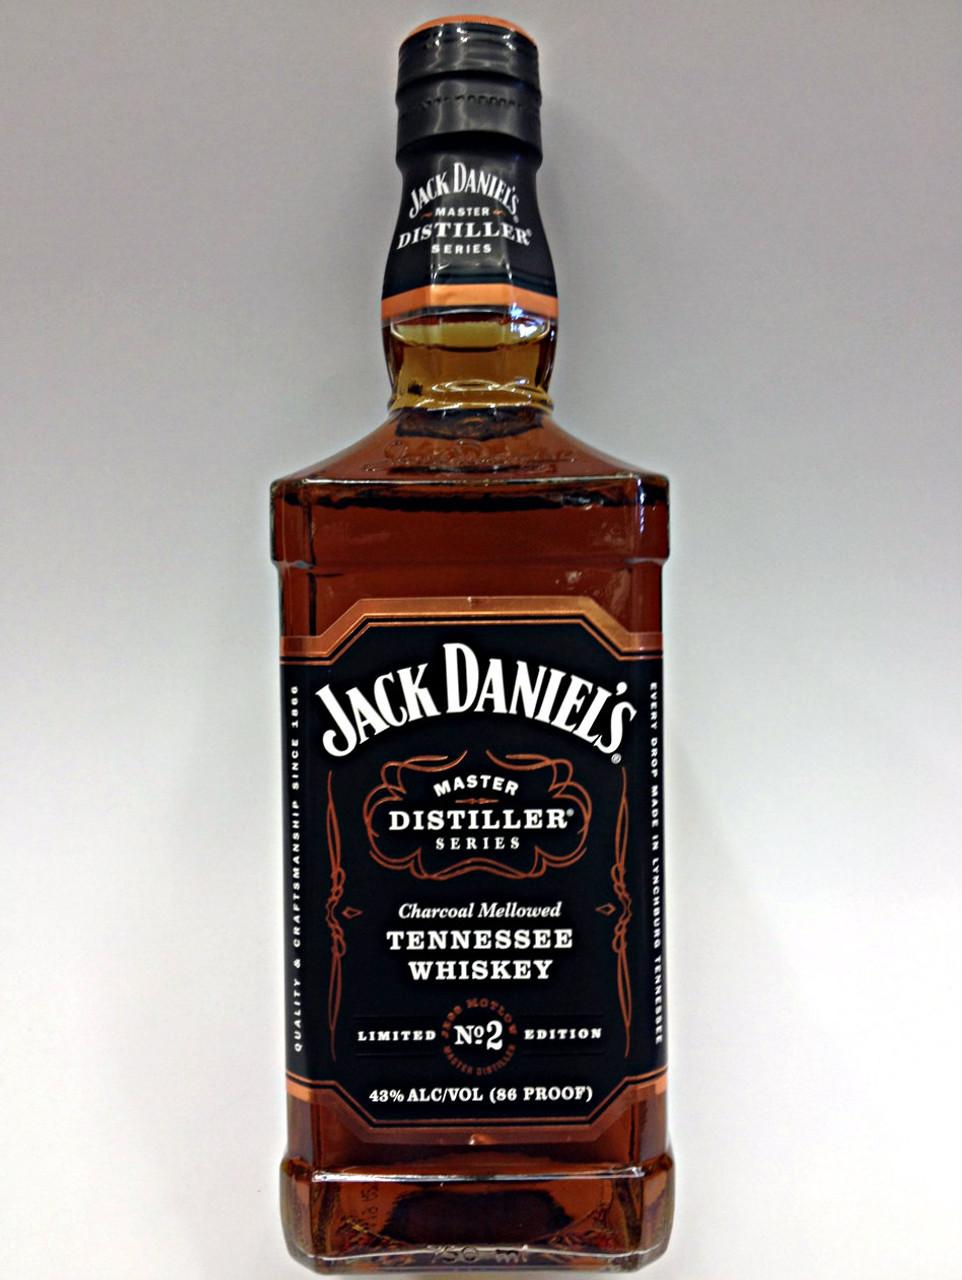 Jack Daniels Master Distiller Series No. 2